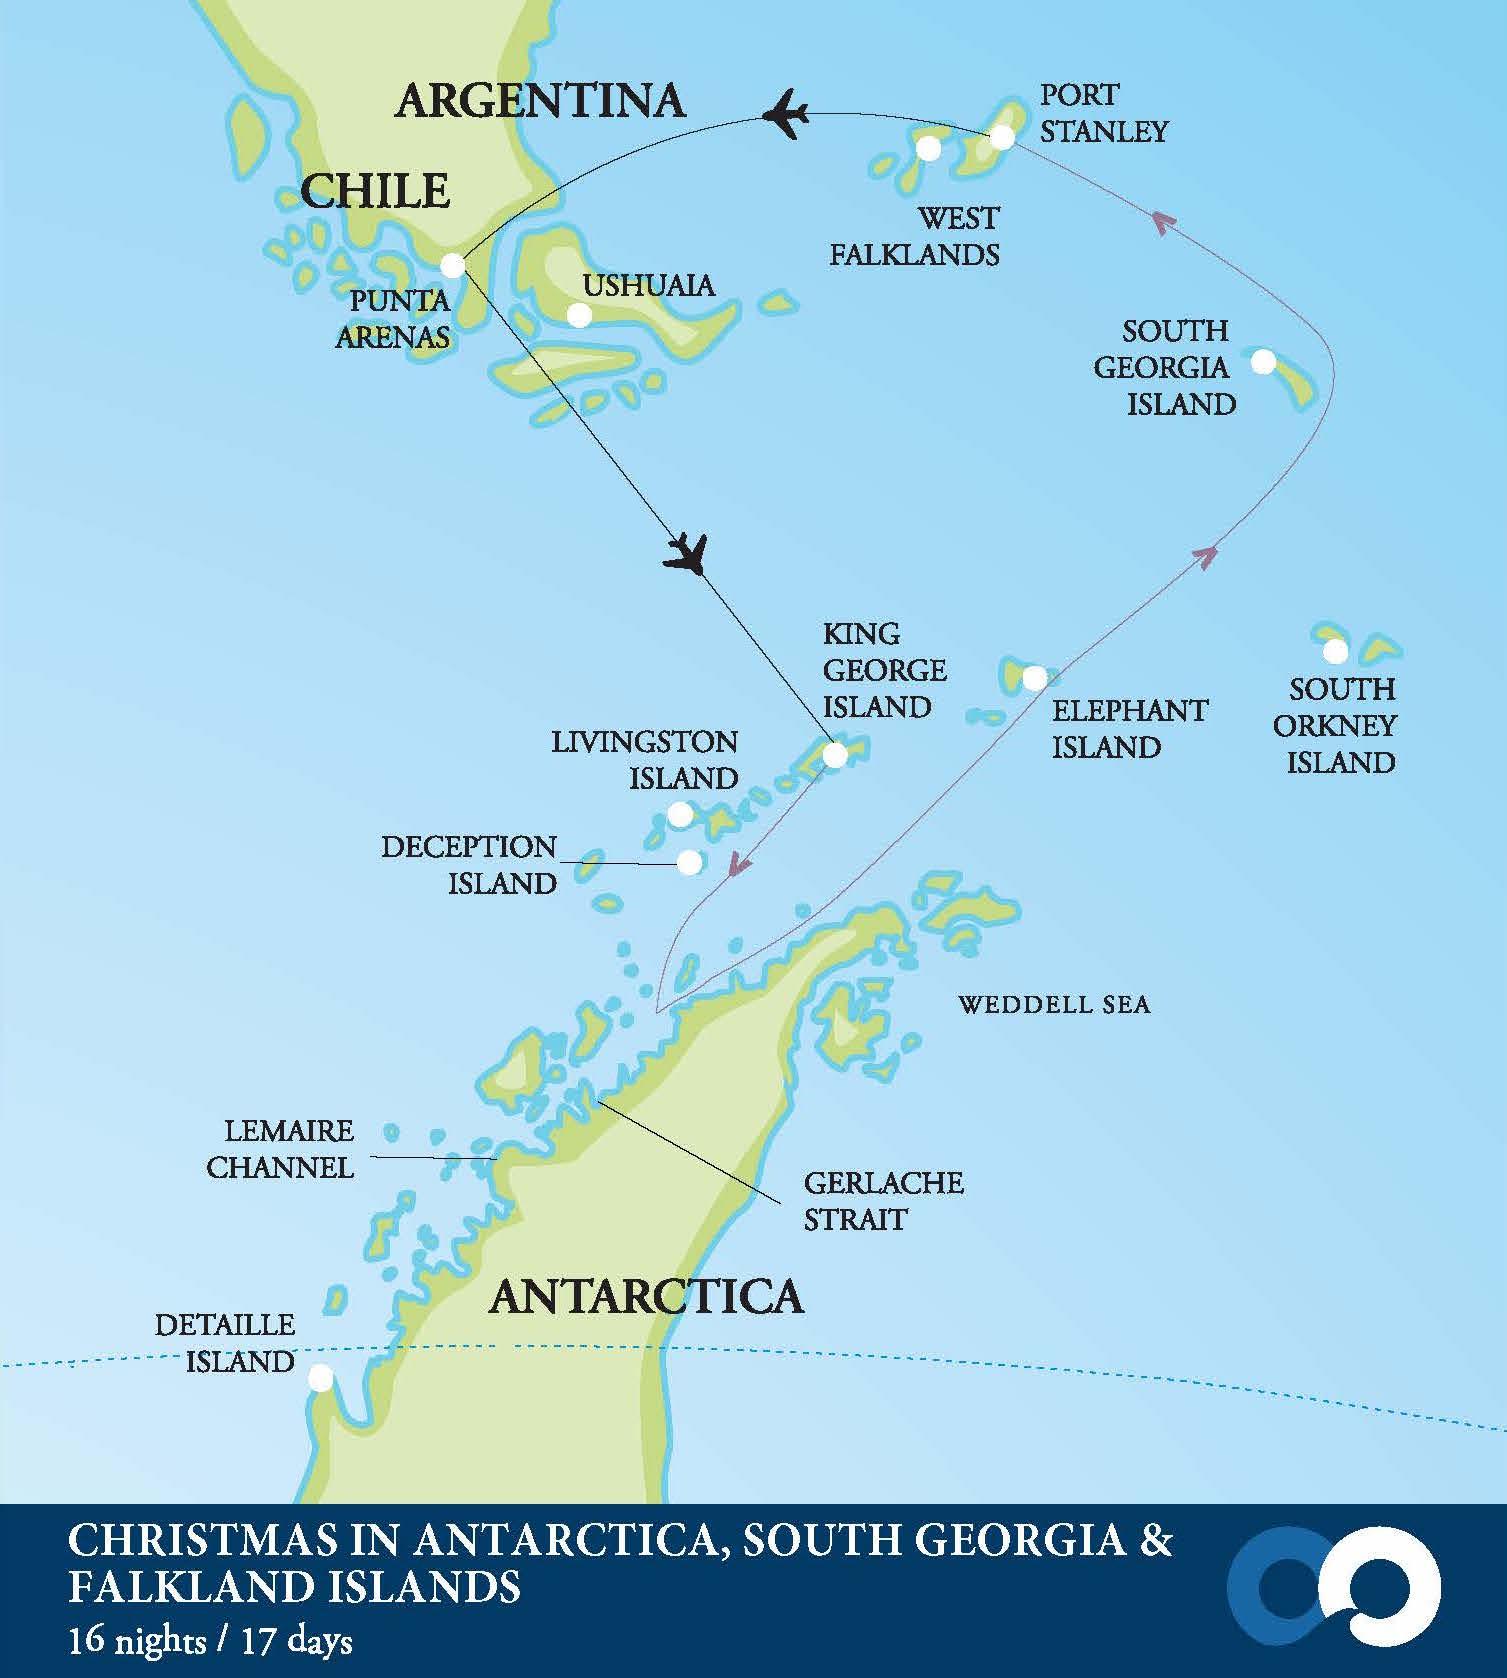 Map for Christmas in Antarctica, South Georgia & Falklands